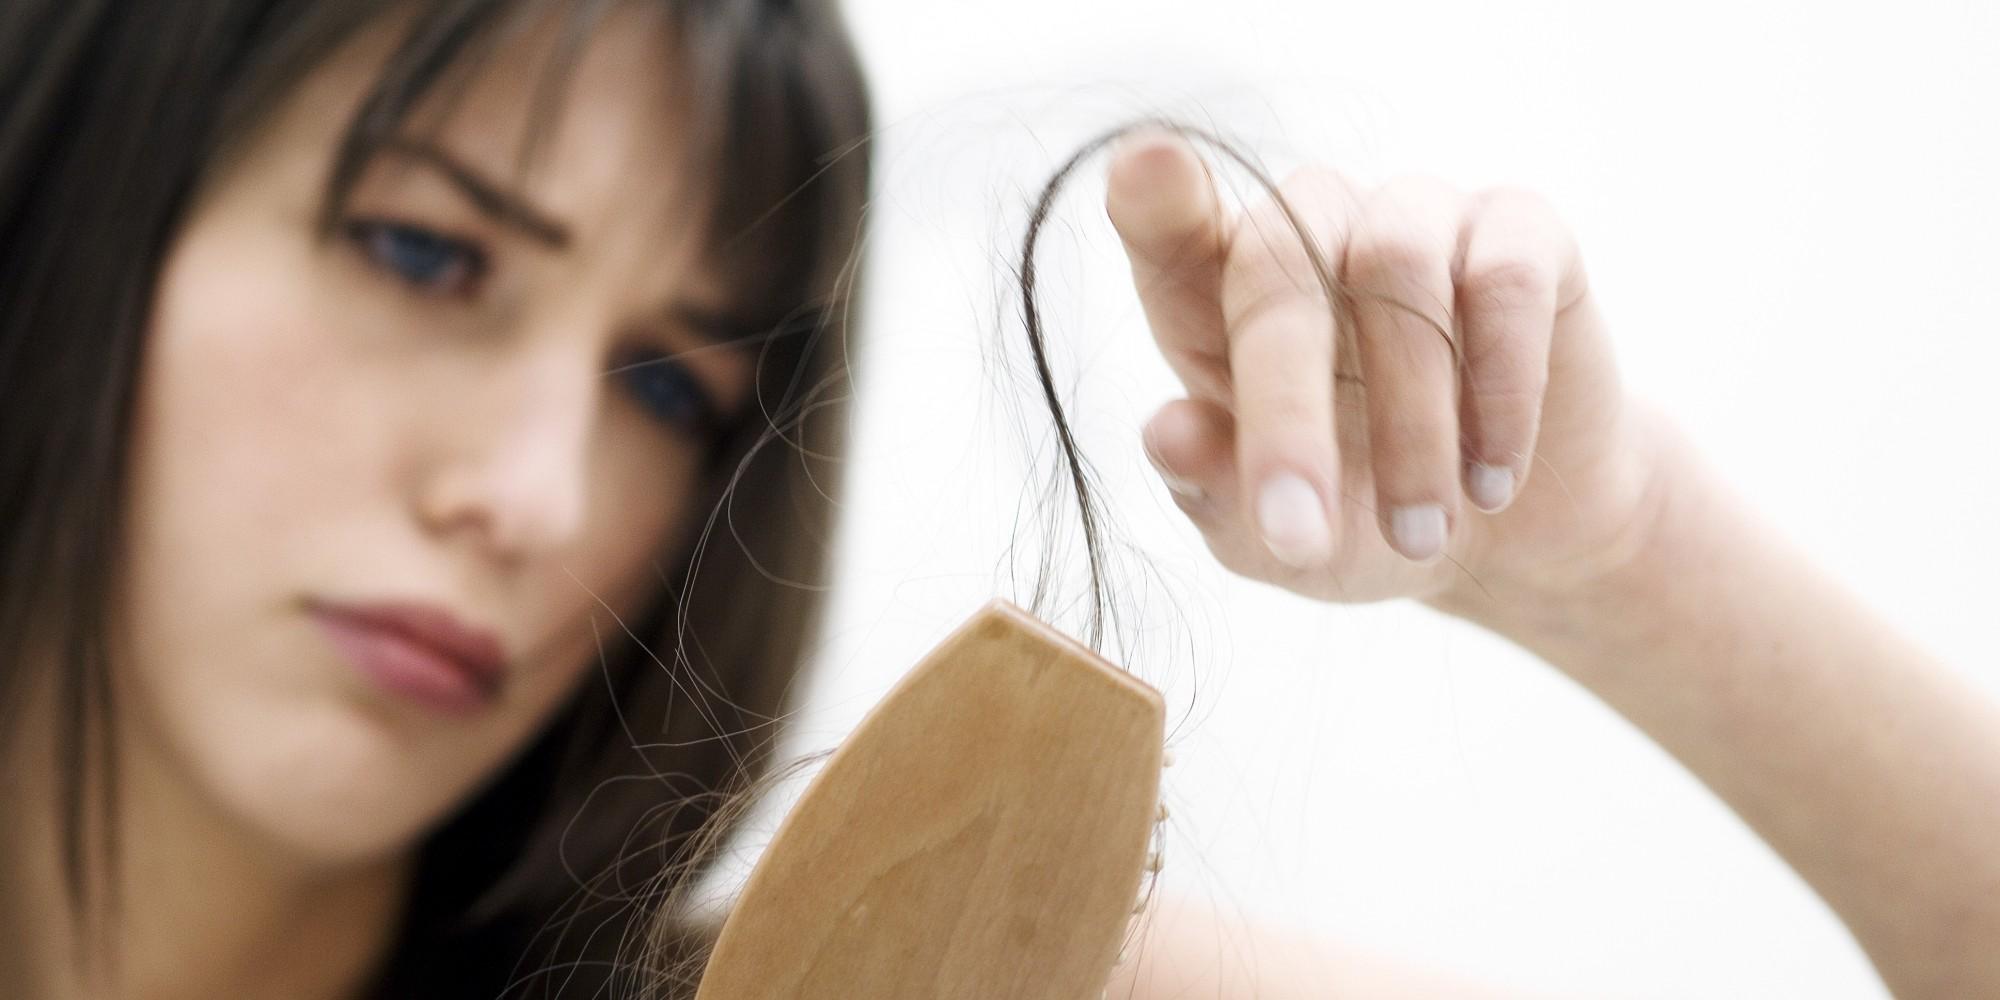 Hair Transplant For Baldness Treatment